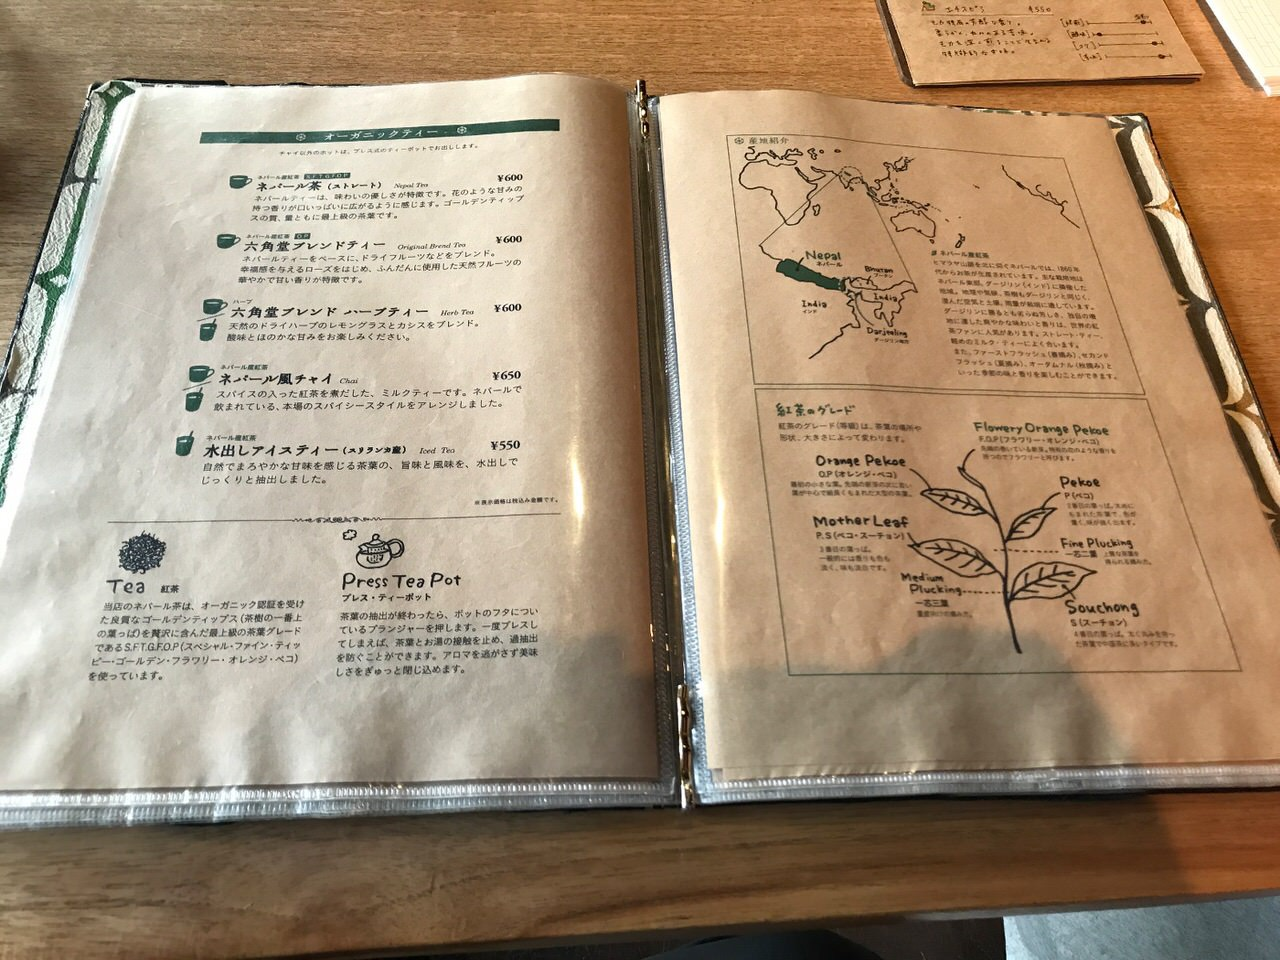 「六角堂」 富山県射水市のカフェ